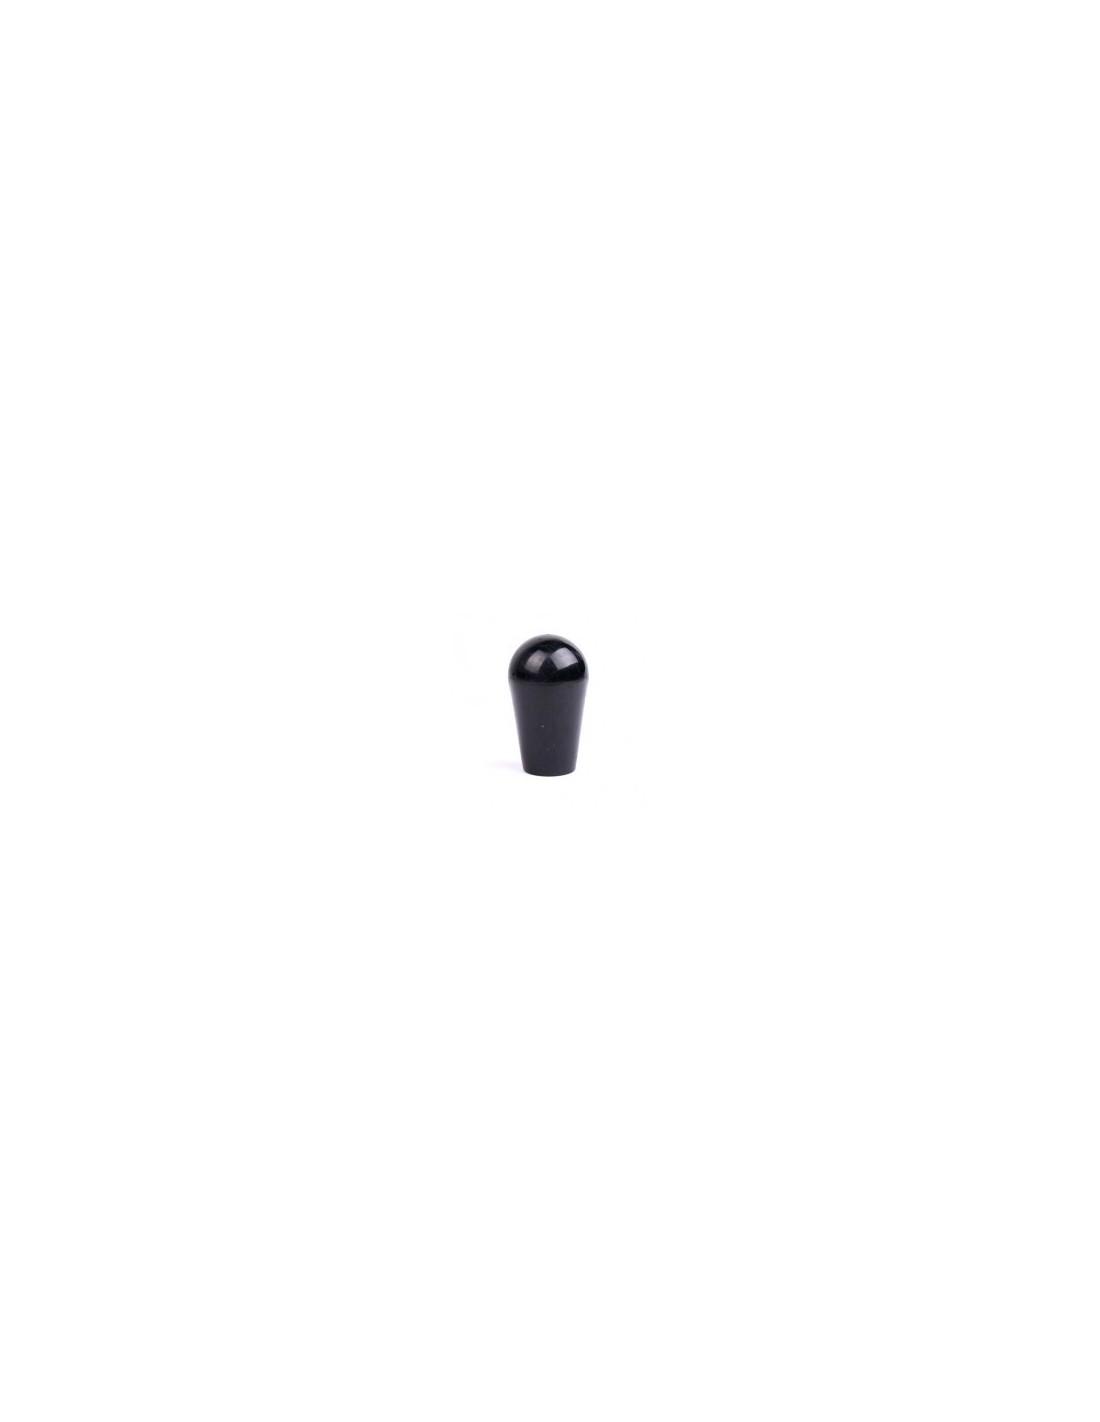 KOH01066 - Tap handle black short